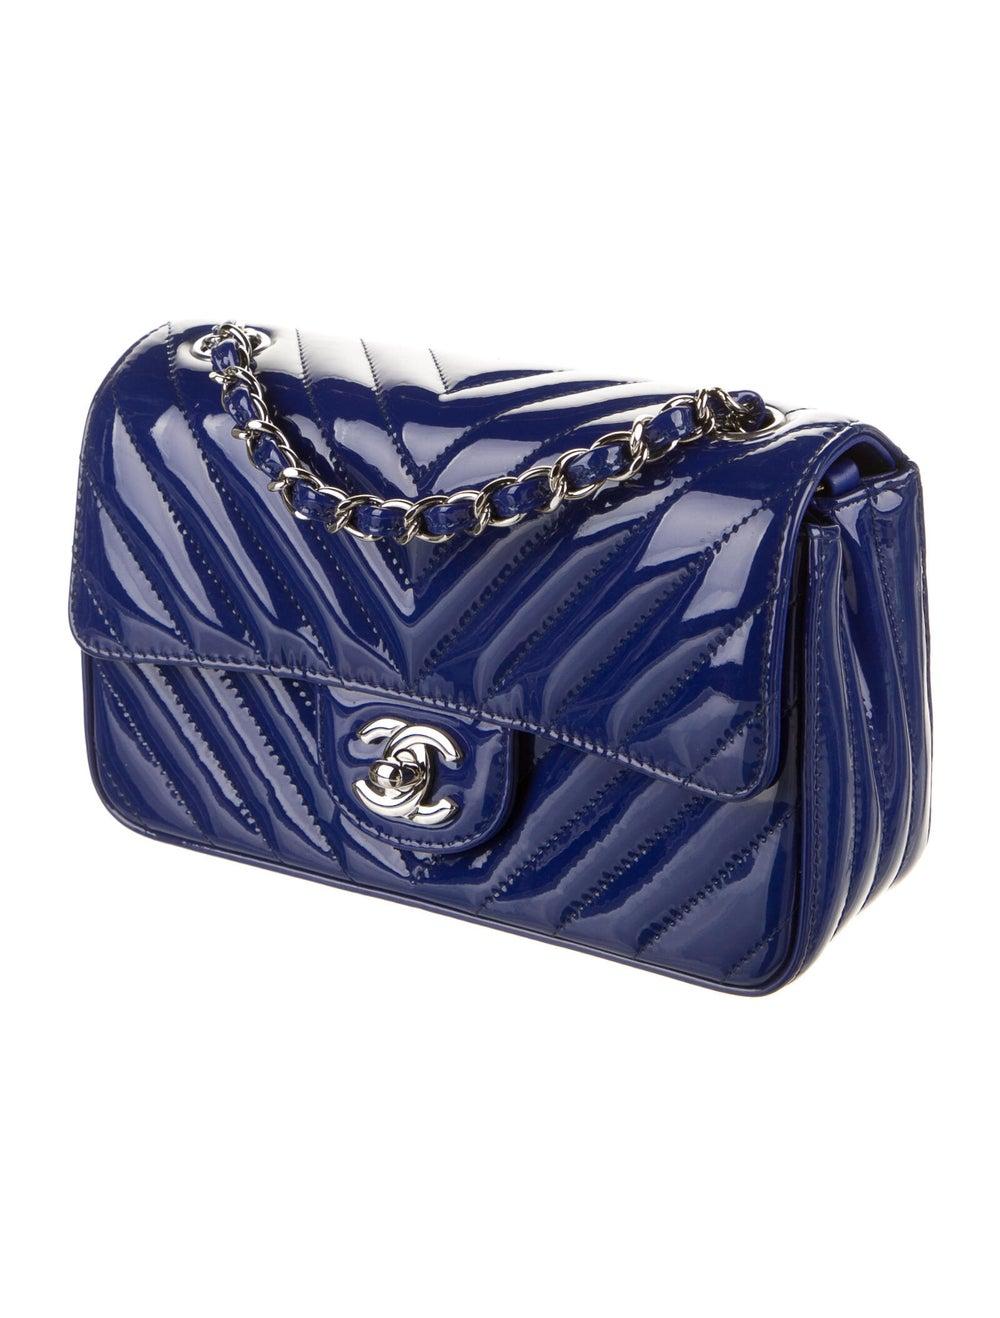 Chanel New Mini Chevron Flap Bag Blue - image 3